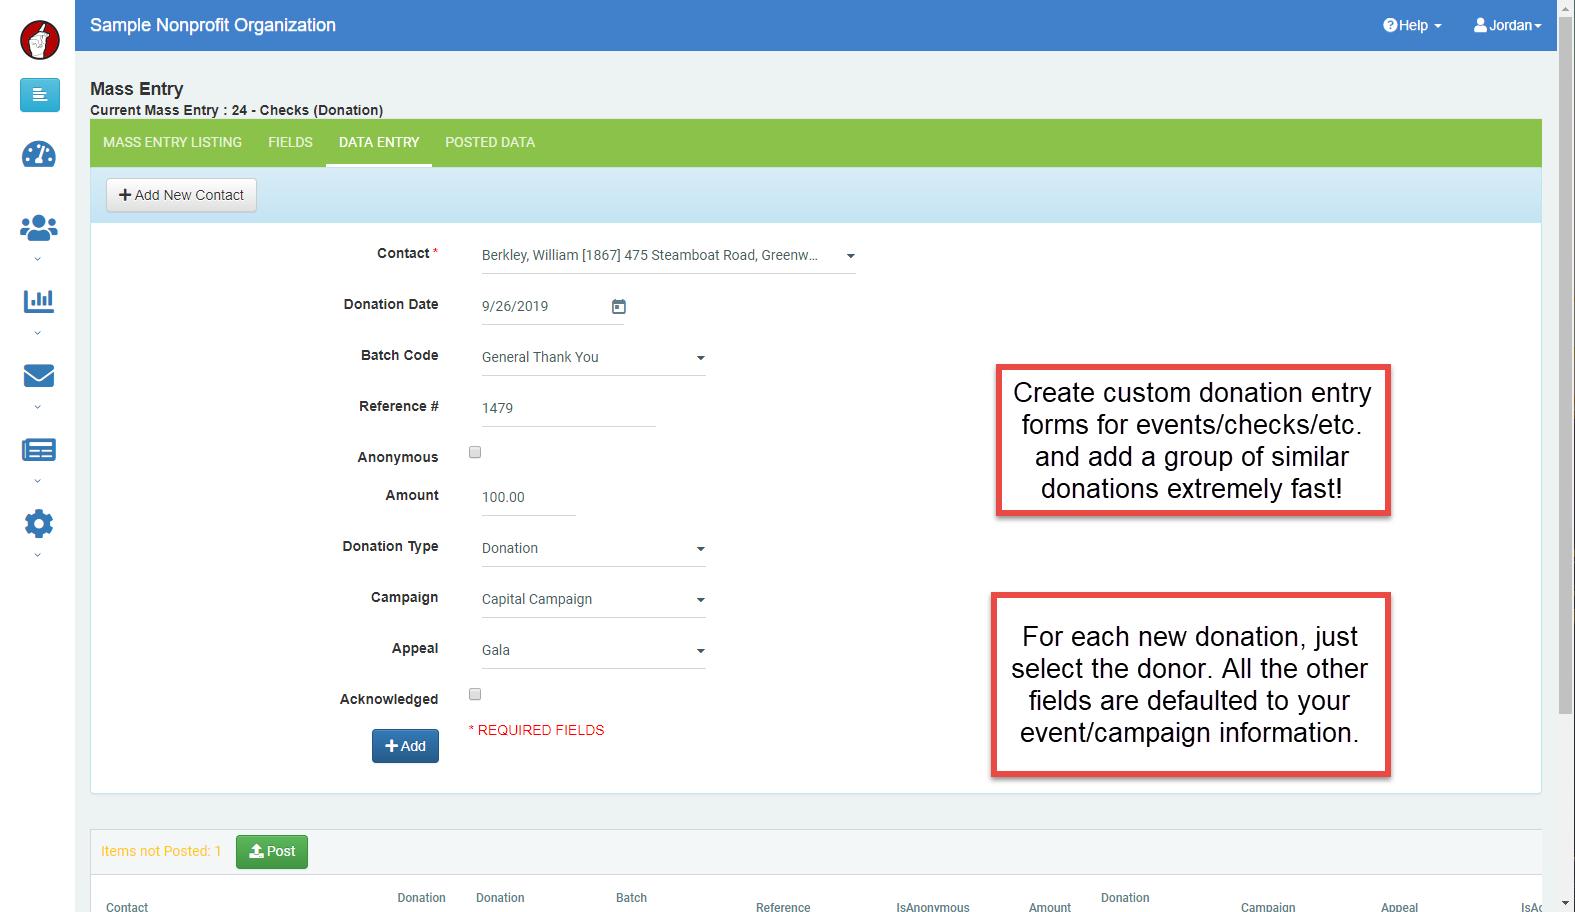 DonorSnap mass entry screenshot